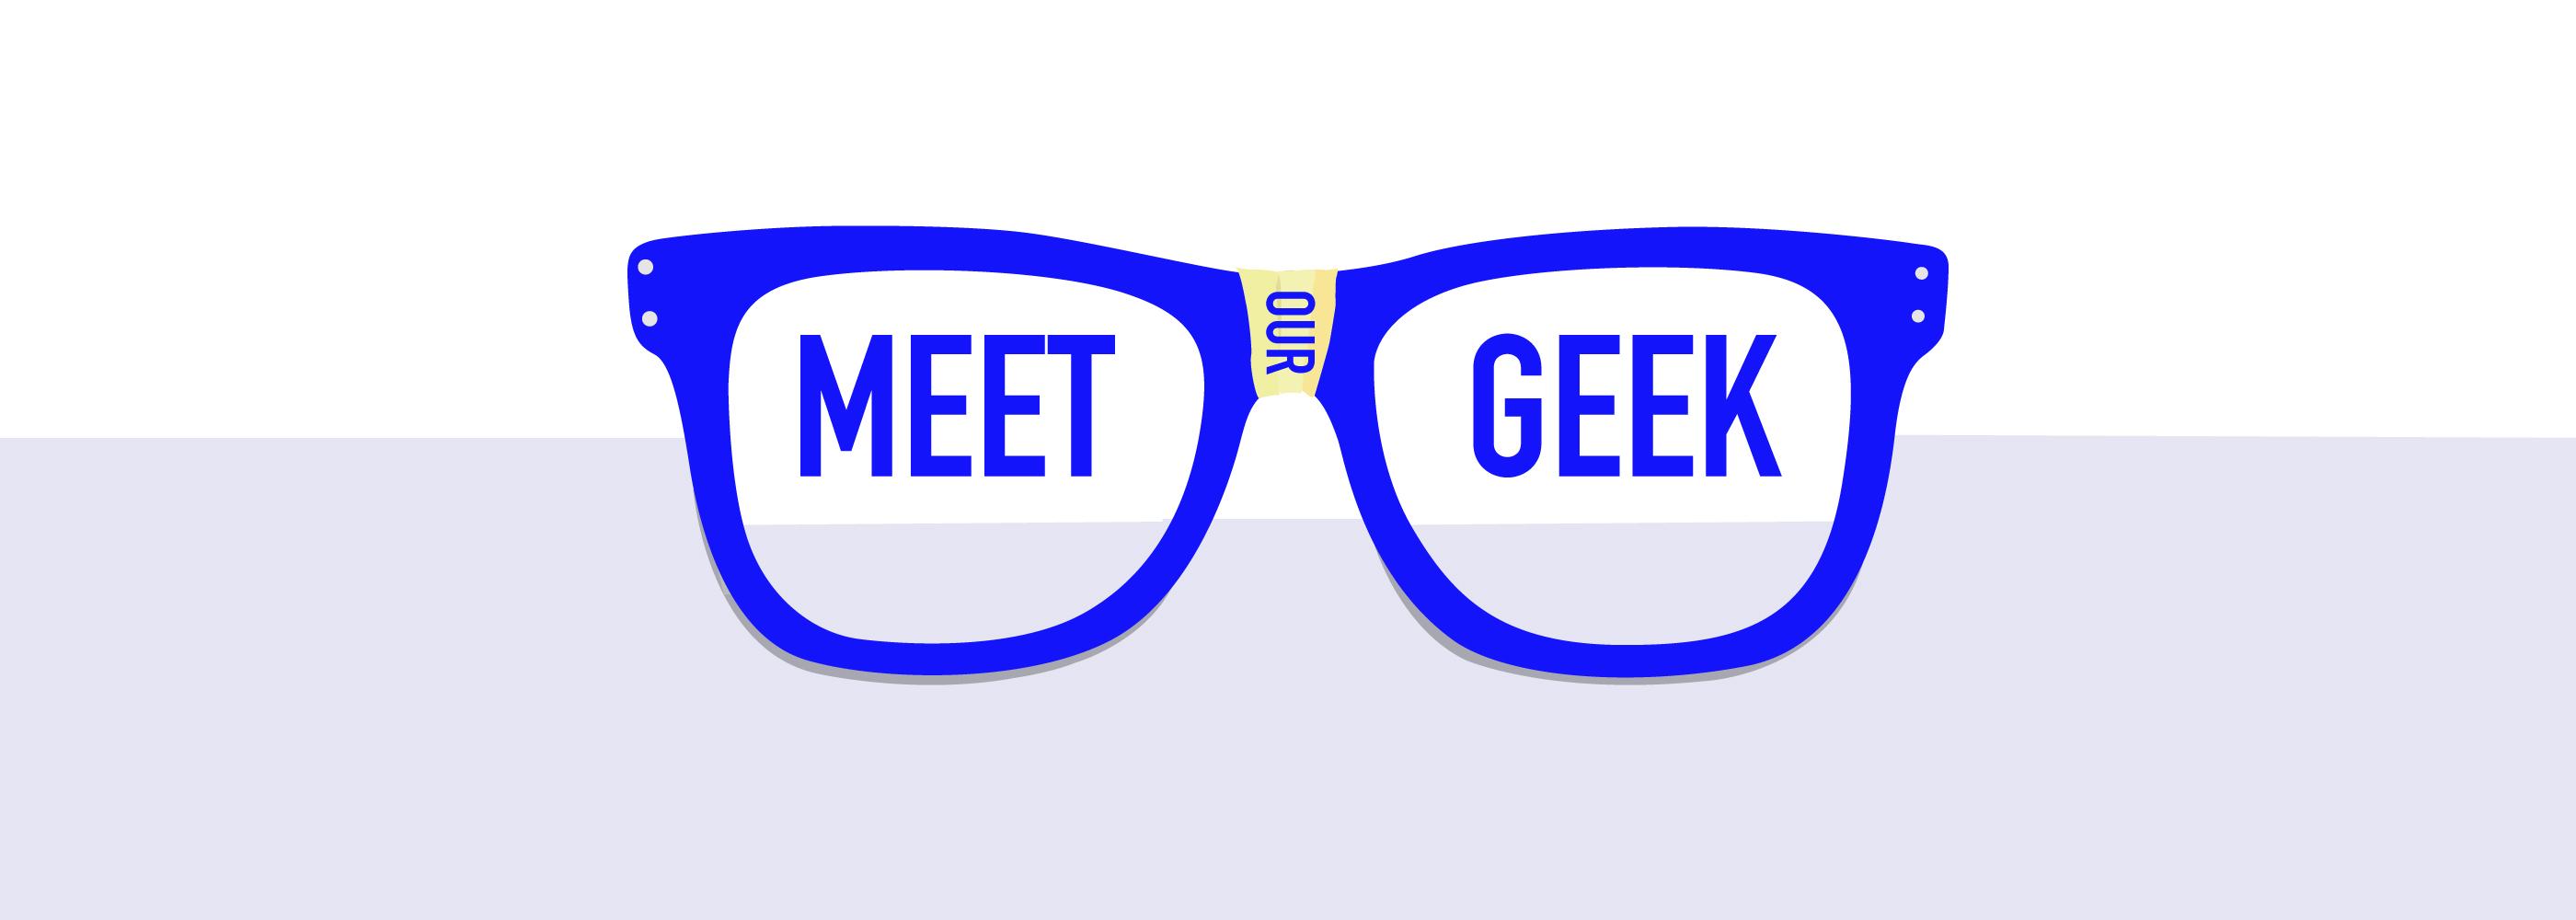 Meet our geek